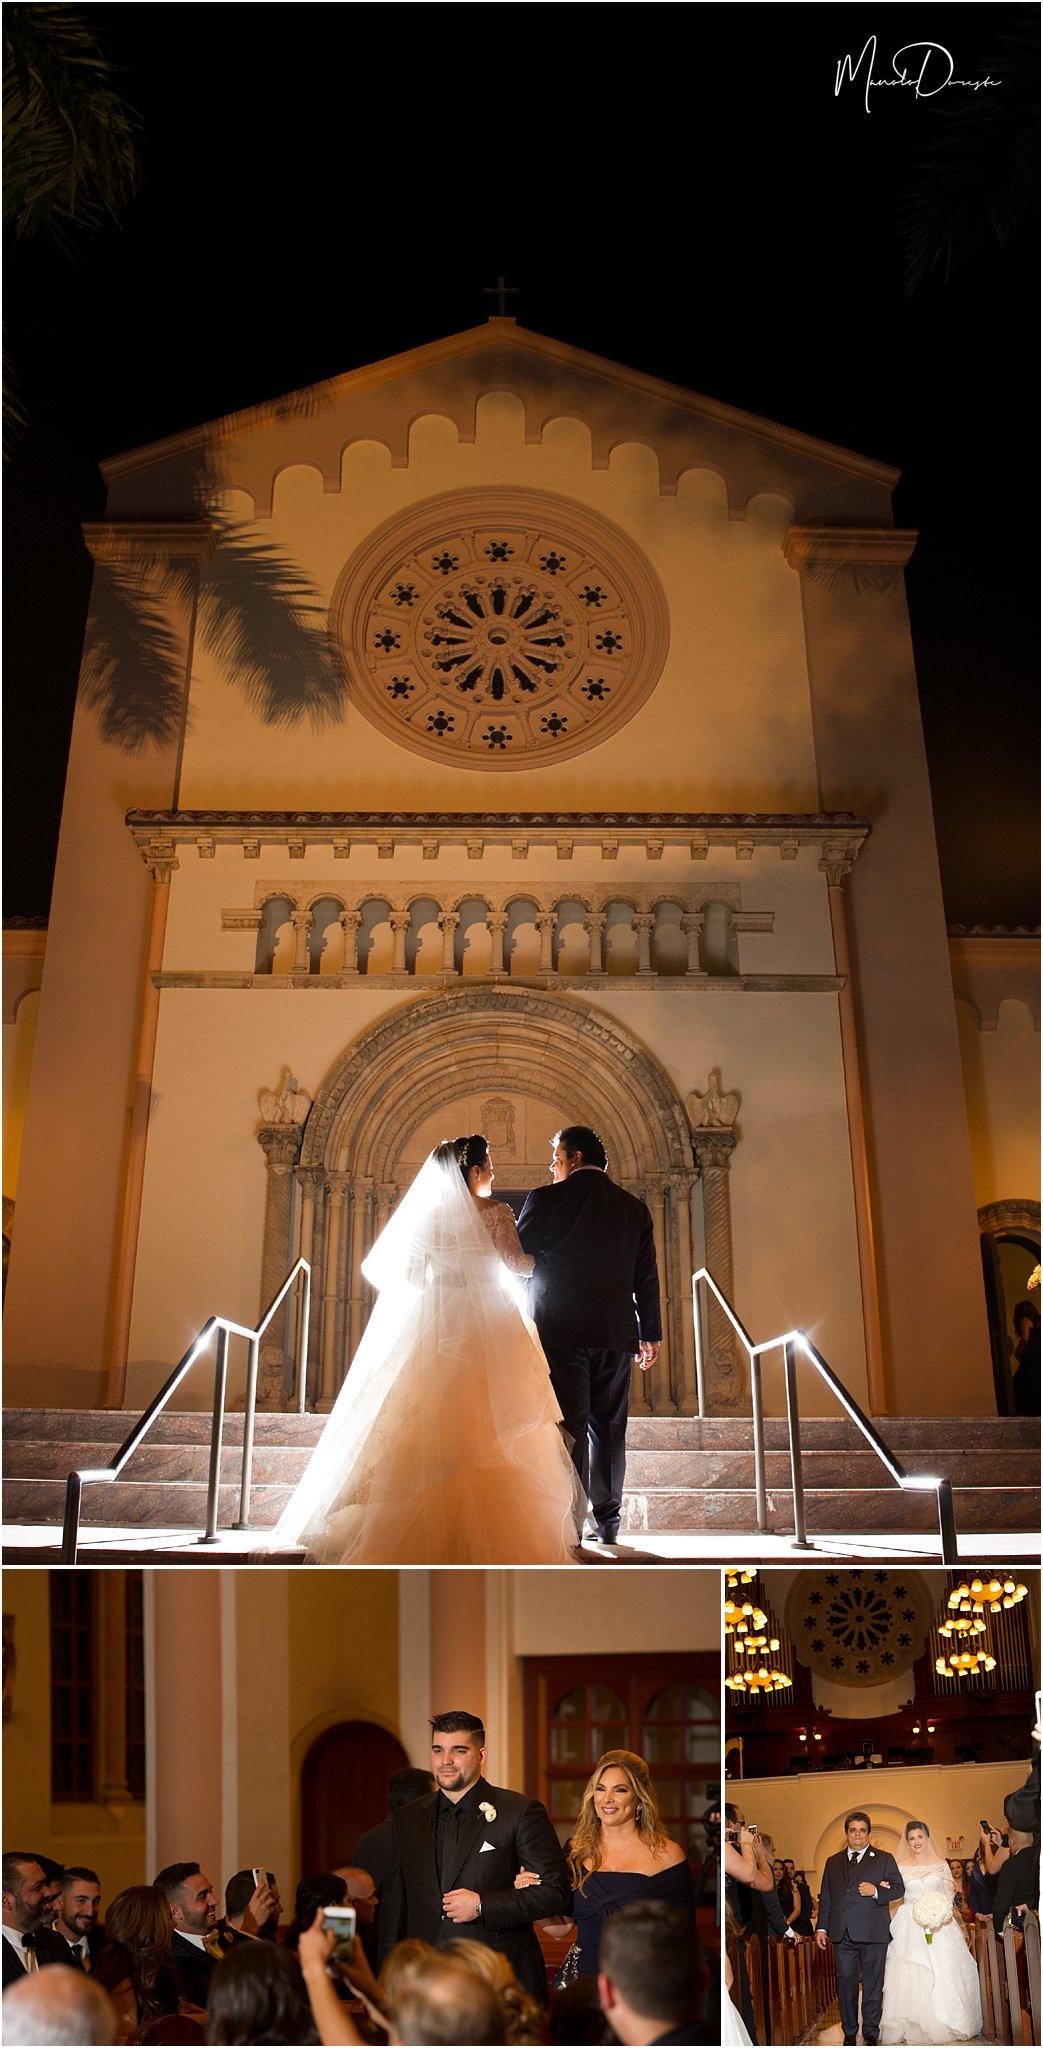 00960_ManoloDoreste_InFocusStudios_Wedding_Family_Photography_Miami_MiamiPhotographer.jpg